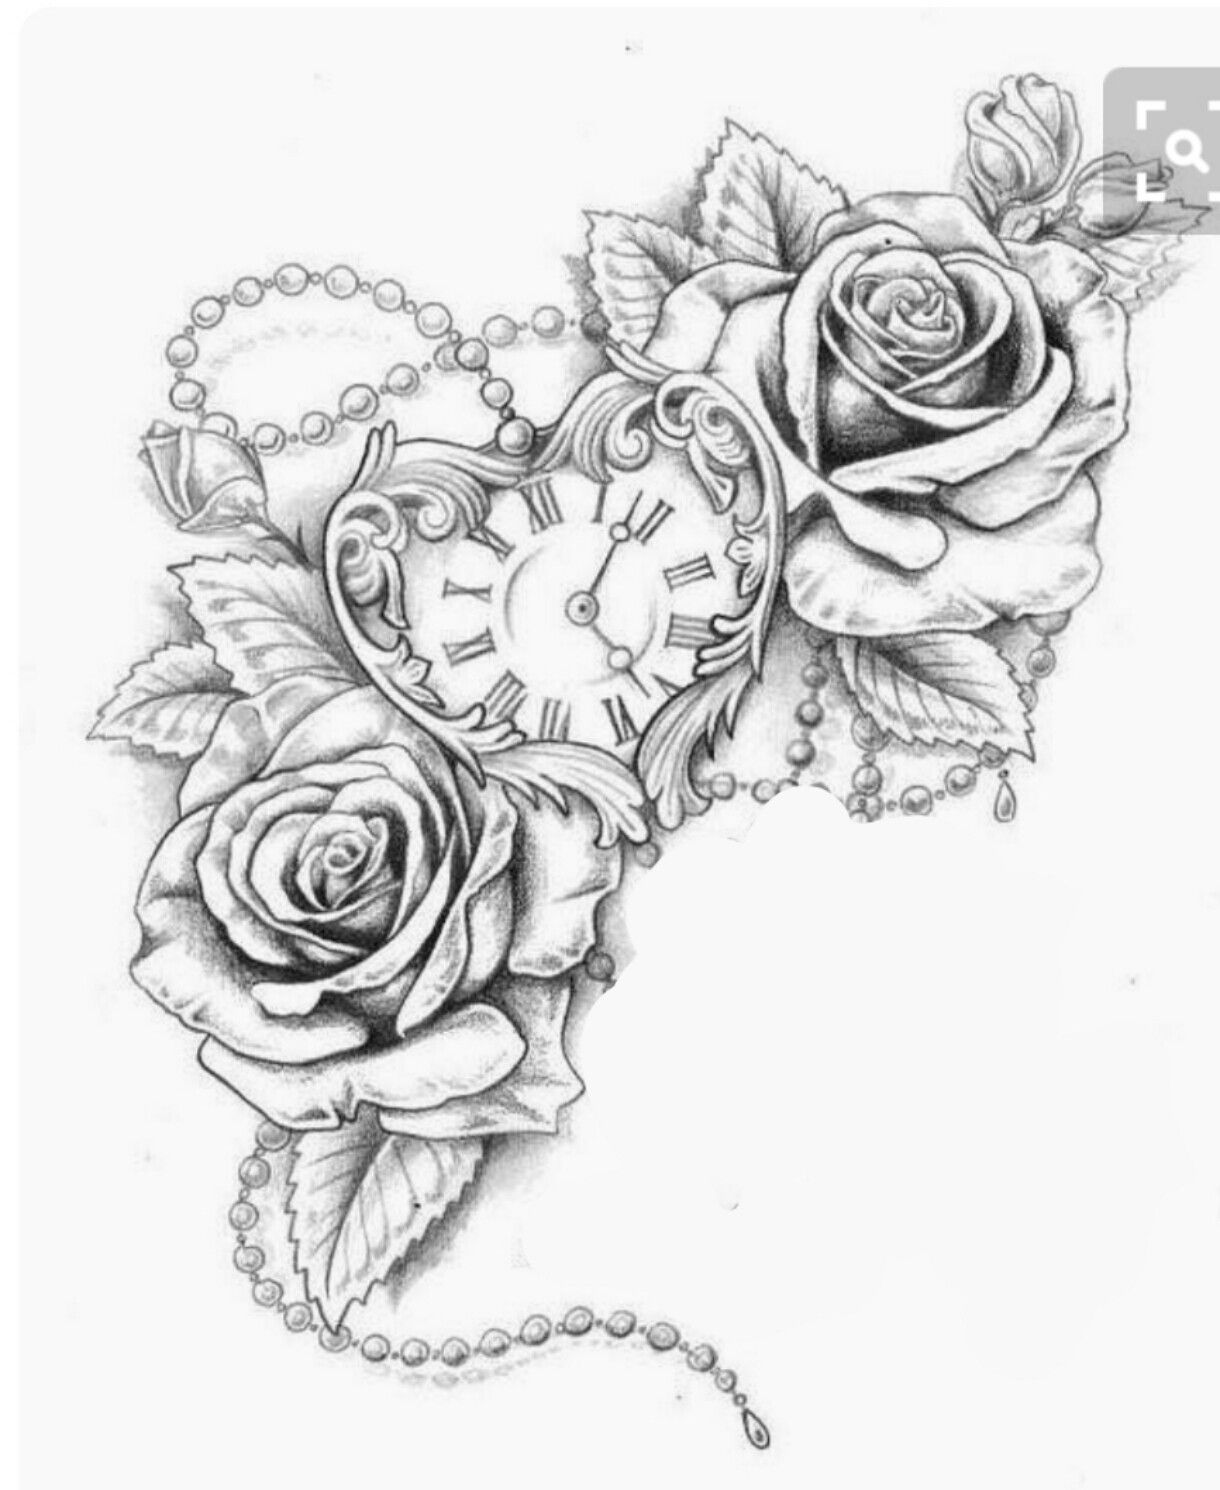 Rose Clock Tattoo Designs Drawing: Tattoos, Half Sleeve Tattoos